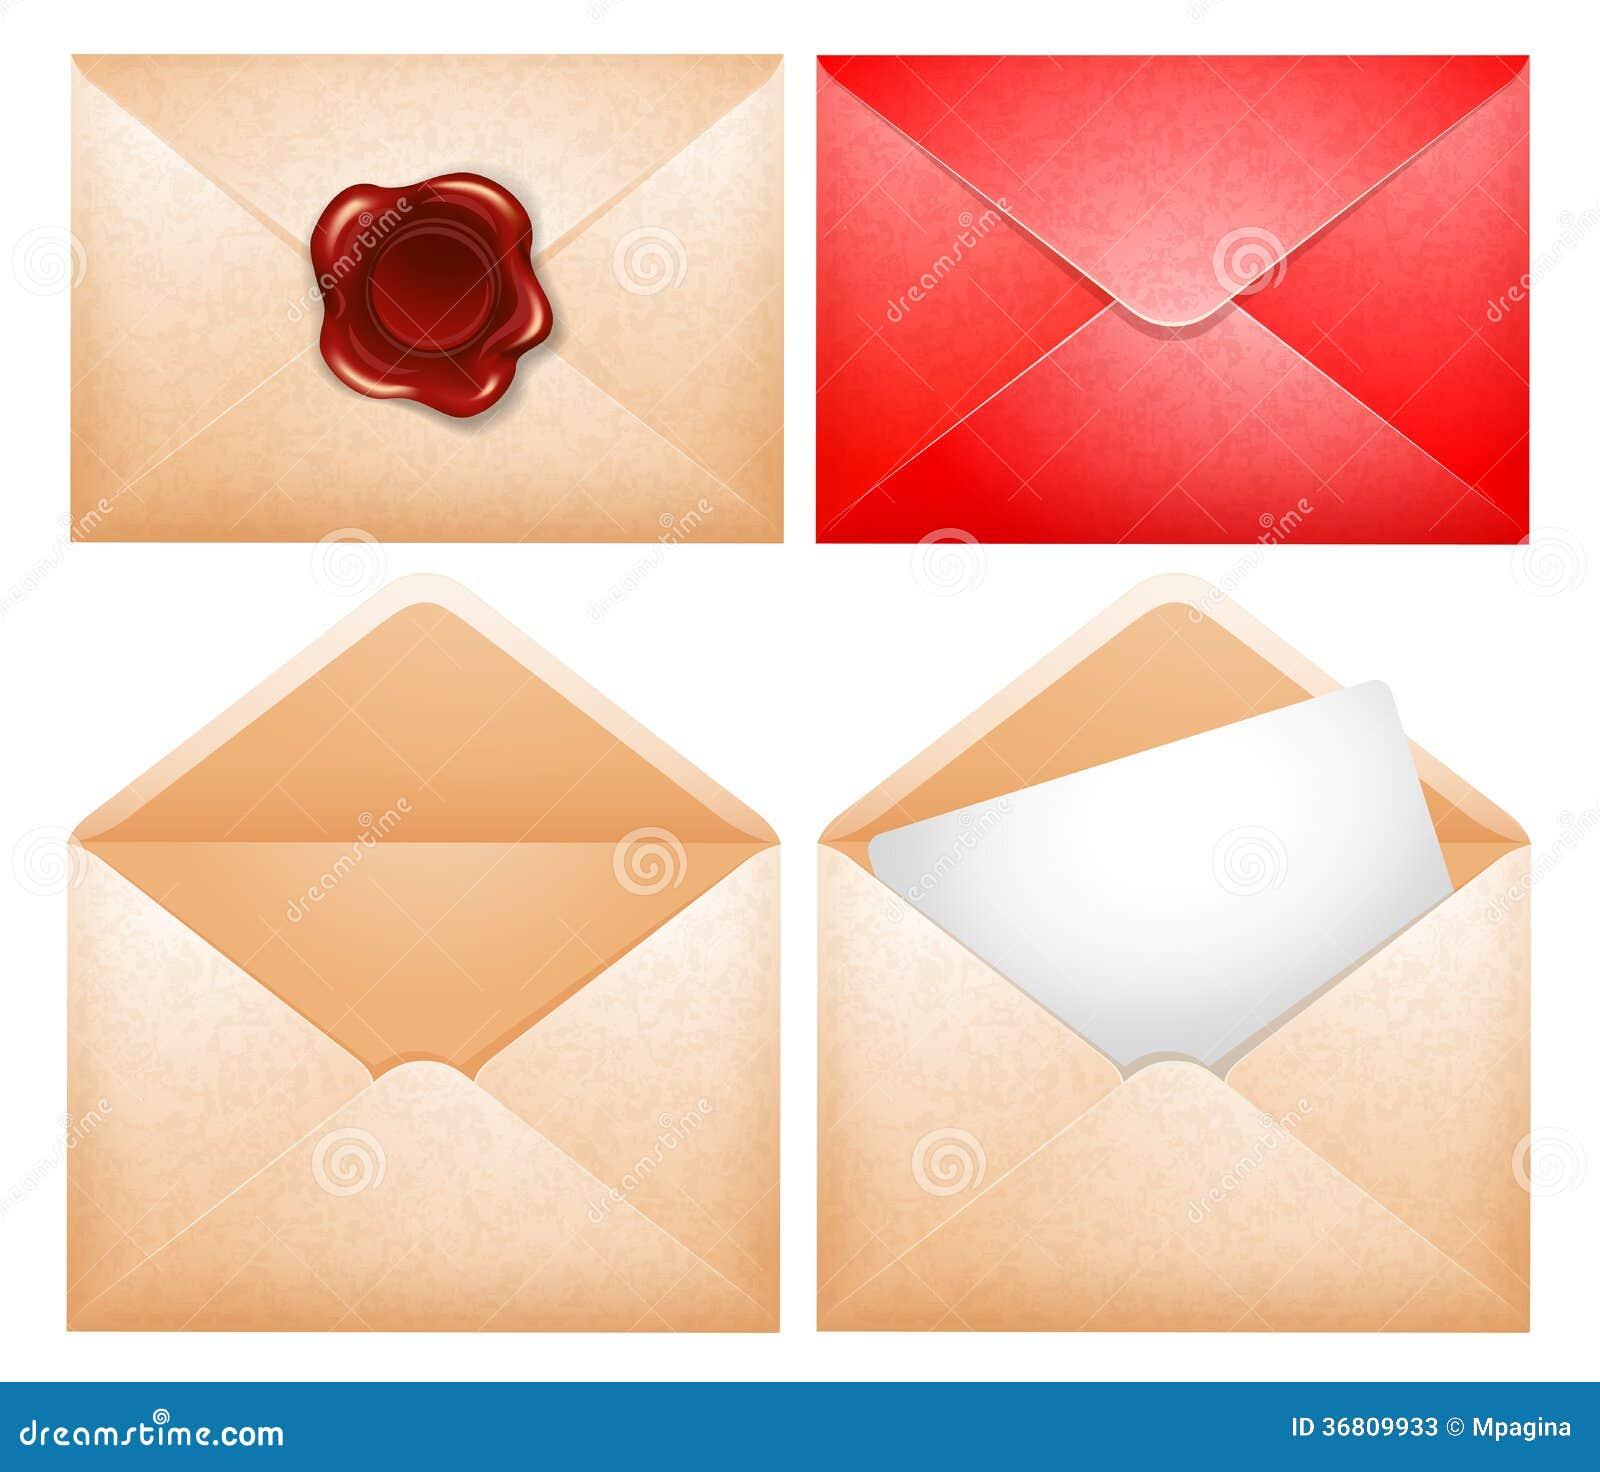 wax paper envelopes 250 x shatter labels 225 x 35 #1 coin envelopes 250 x high quality pre-cut 4  x 4 parchment paper squares, non-stick & heat resistant featuring an.